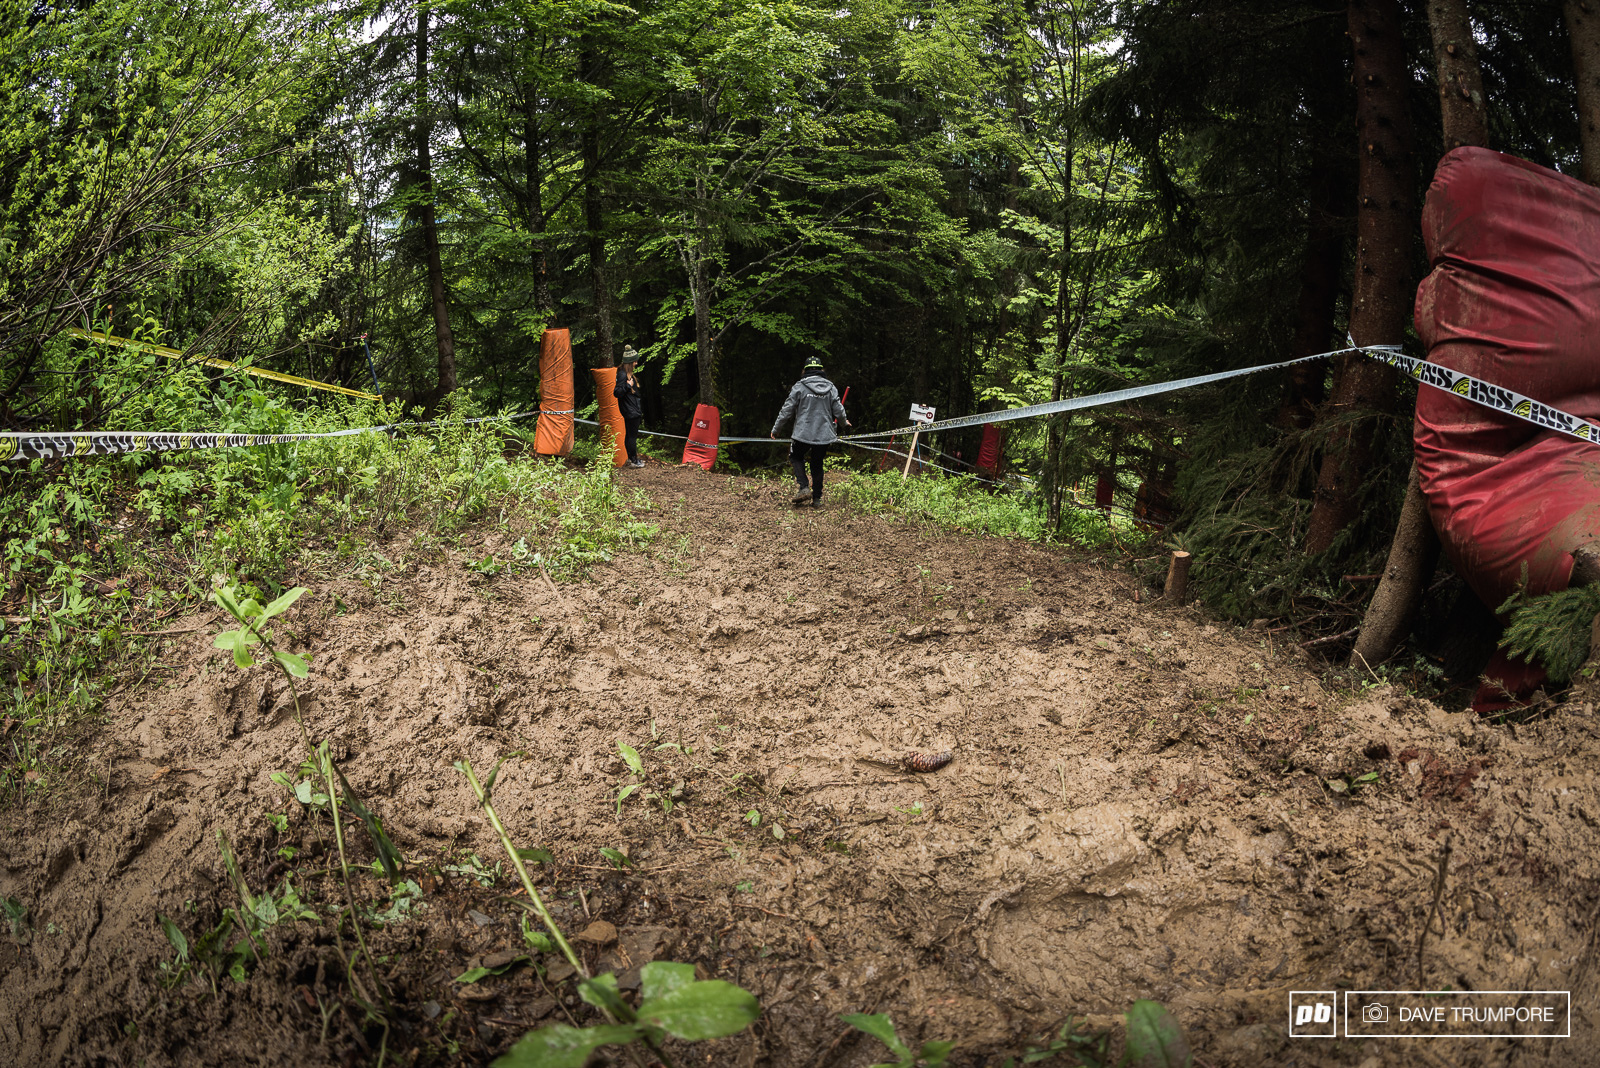 Downhill Track Preview - Crankworx Les Gets 2016